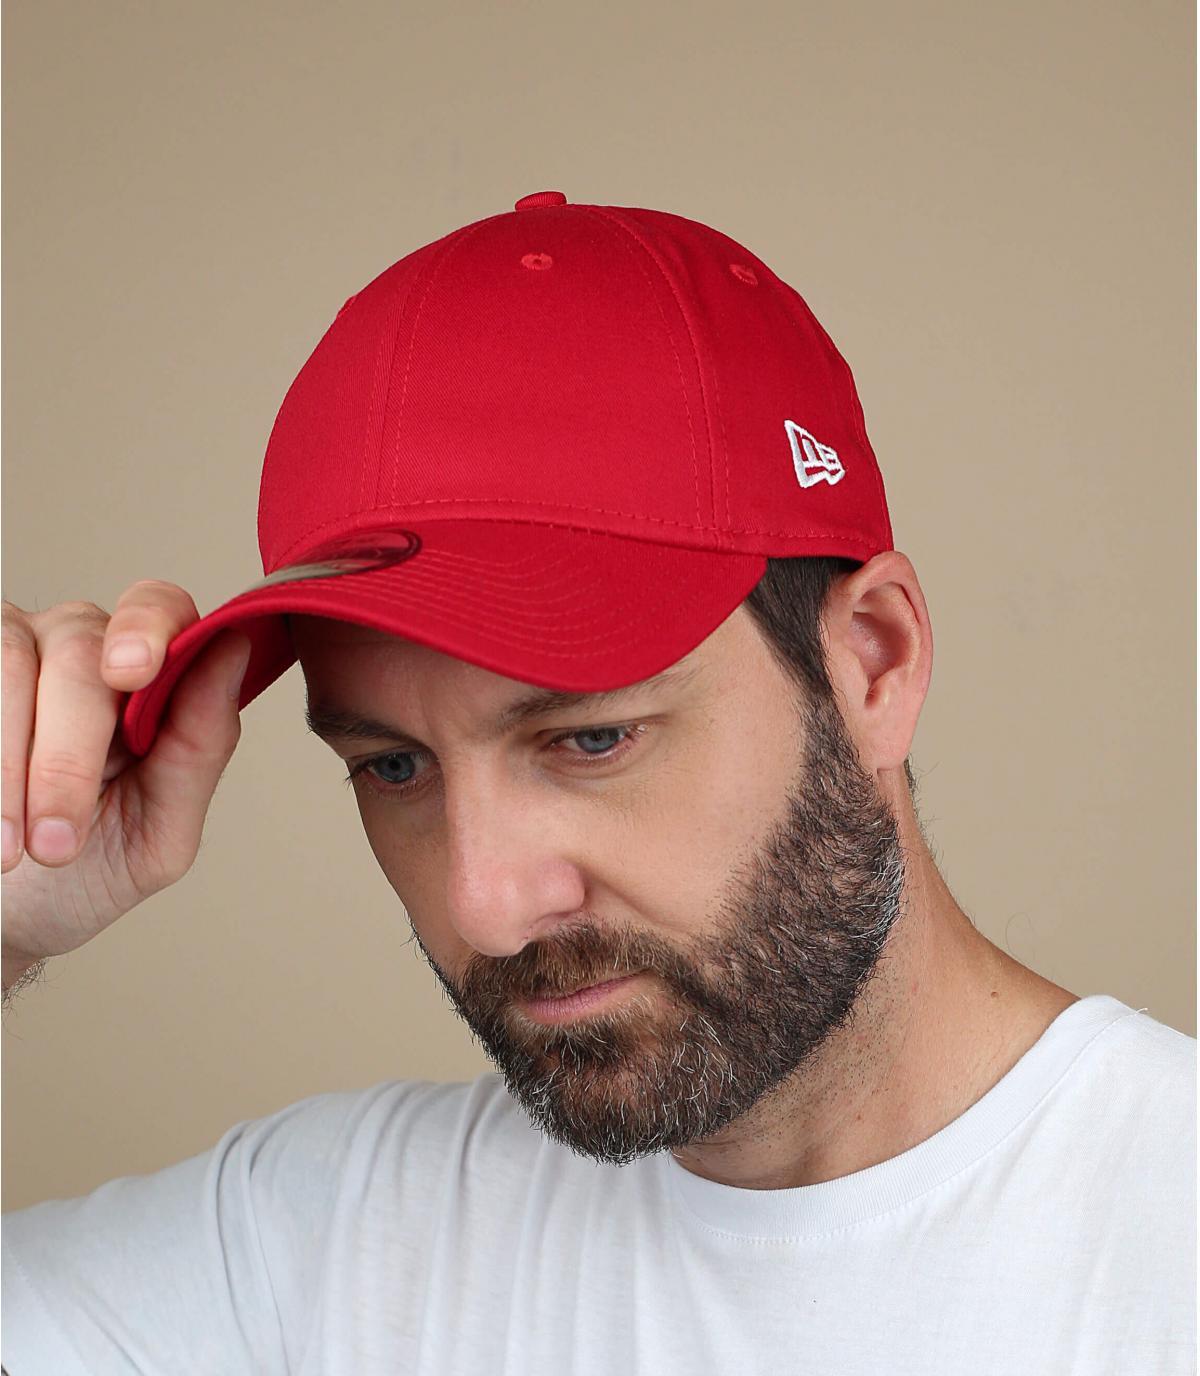 red curved visor cap